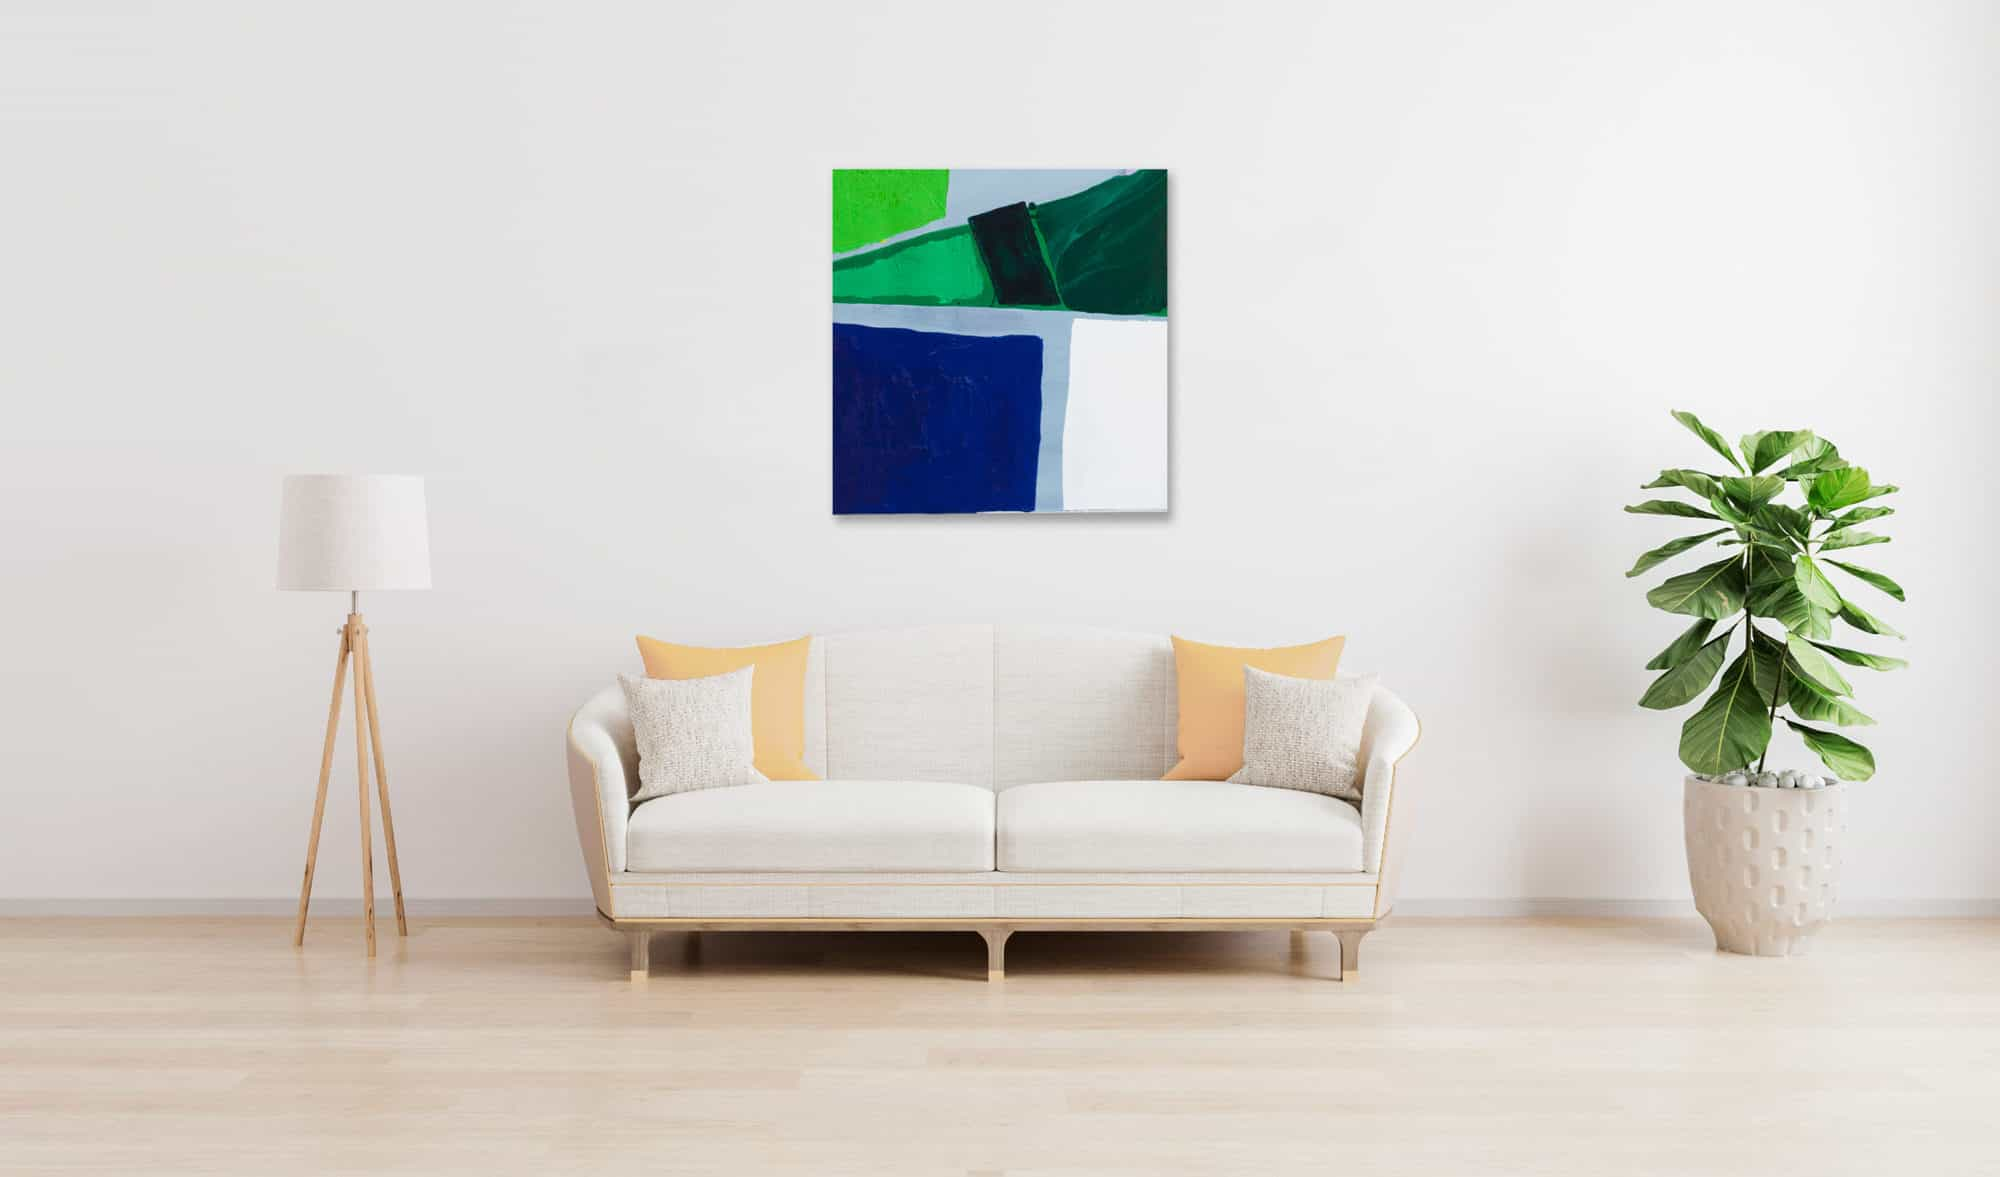 Acrylbild abstrakte Flächen Grün Blau wandbild